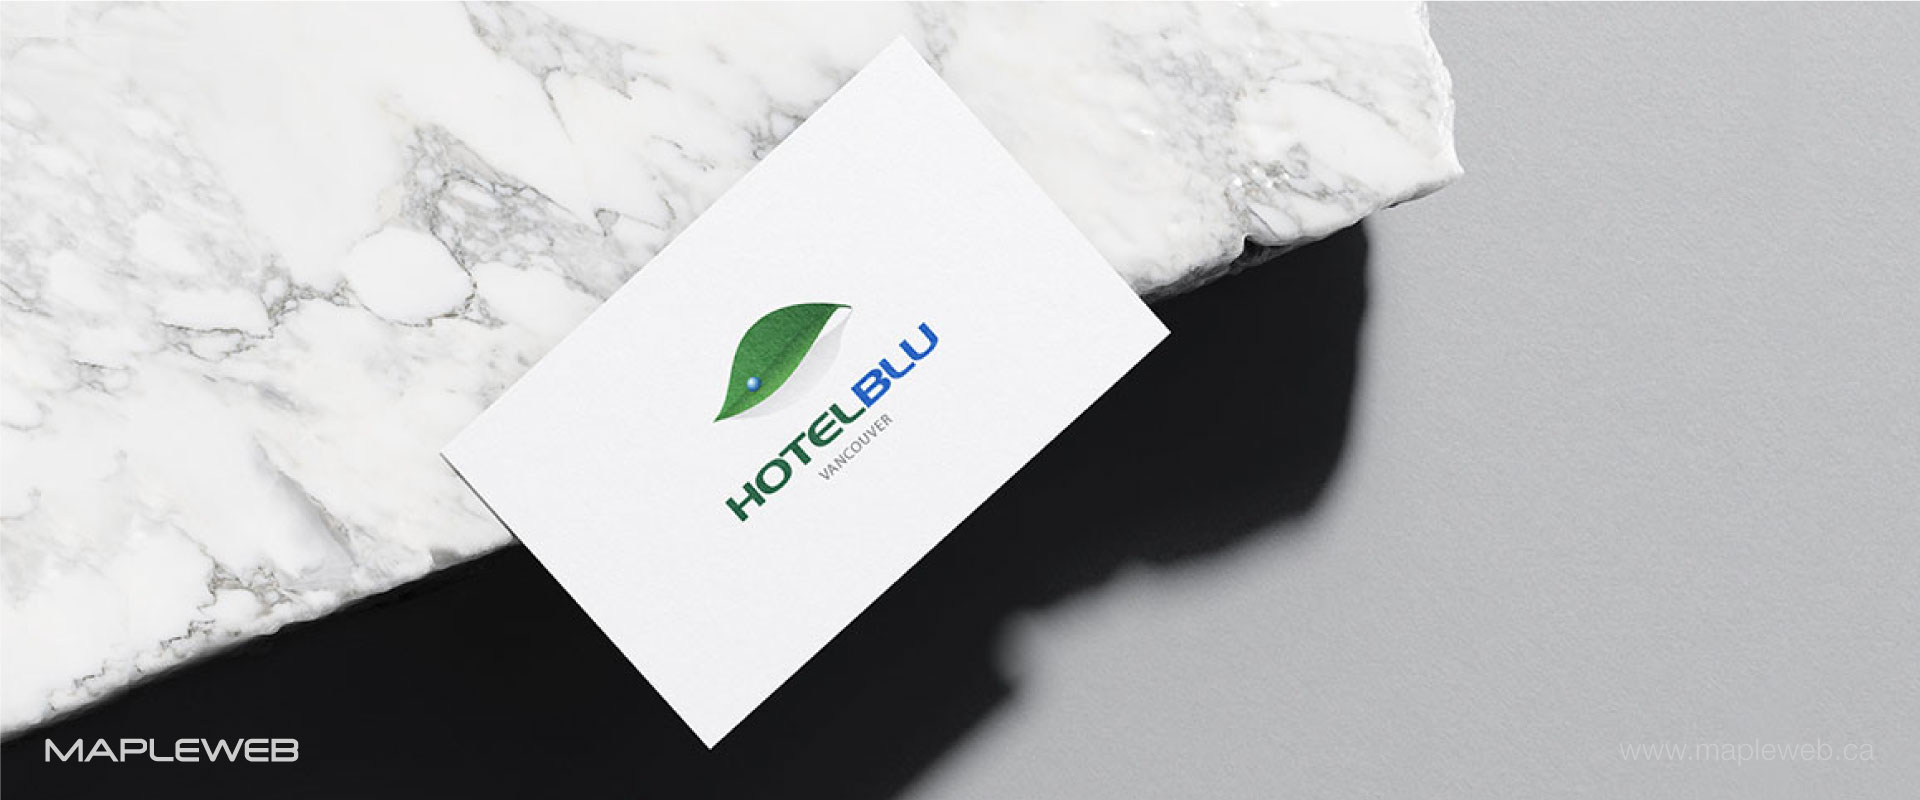 hotel-blu-brand-logo-design-by-mapleweb-vancouver-canada-business-card-mock